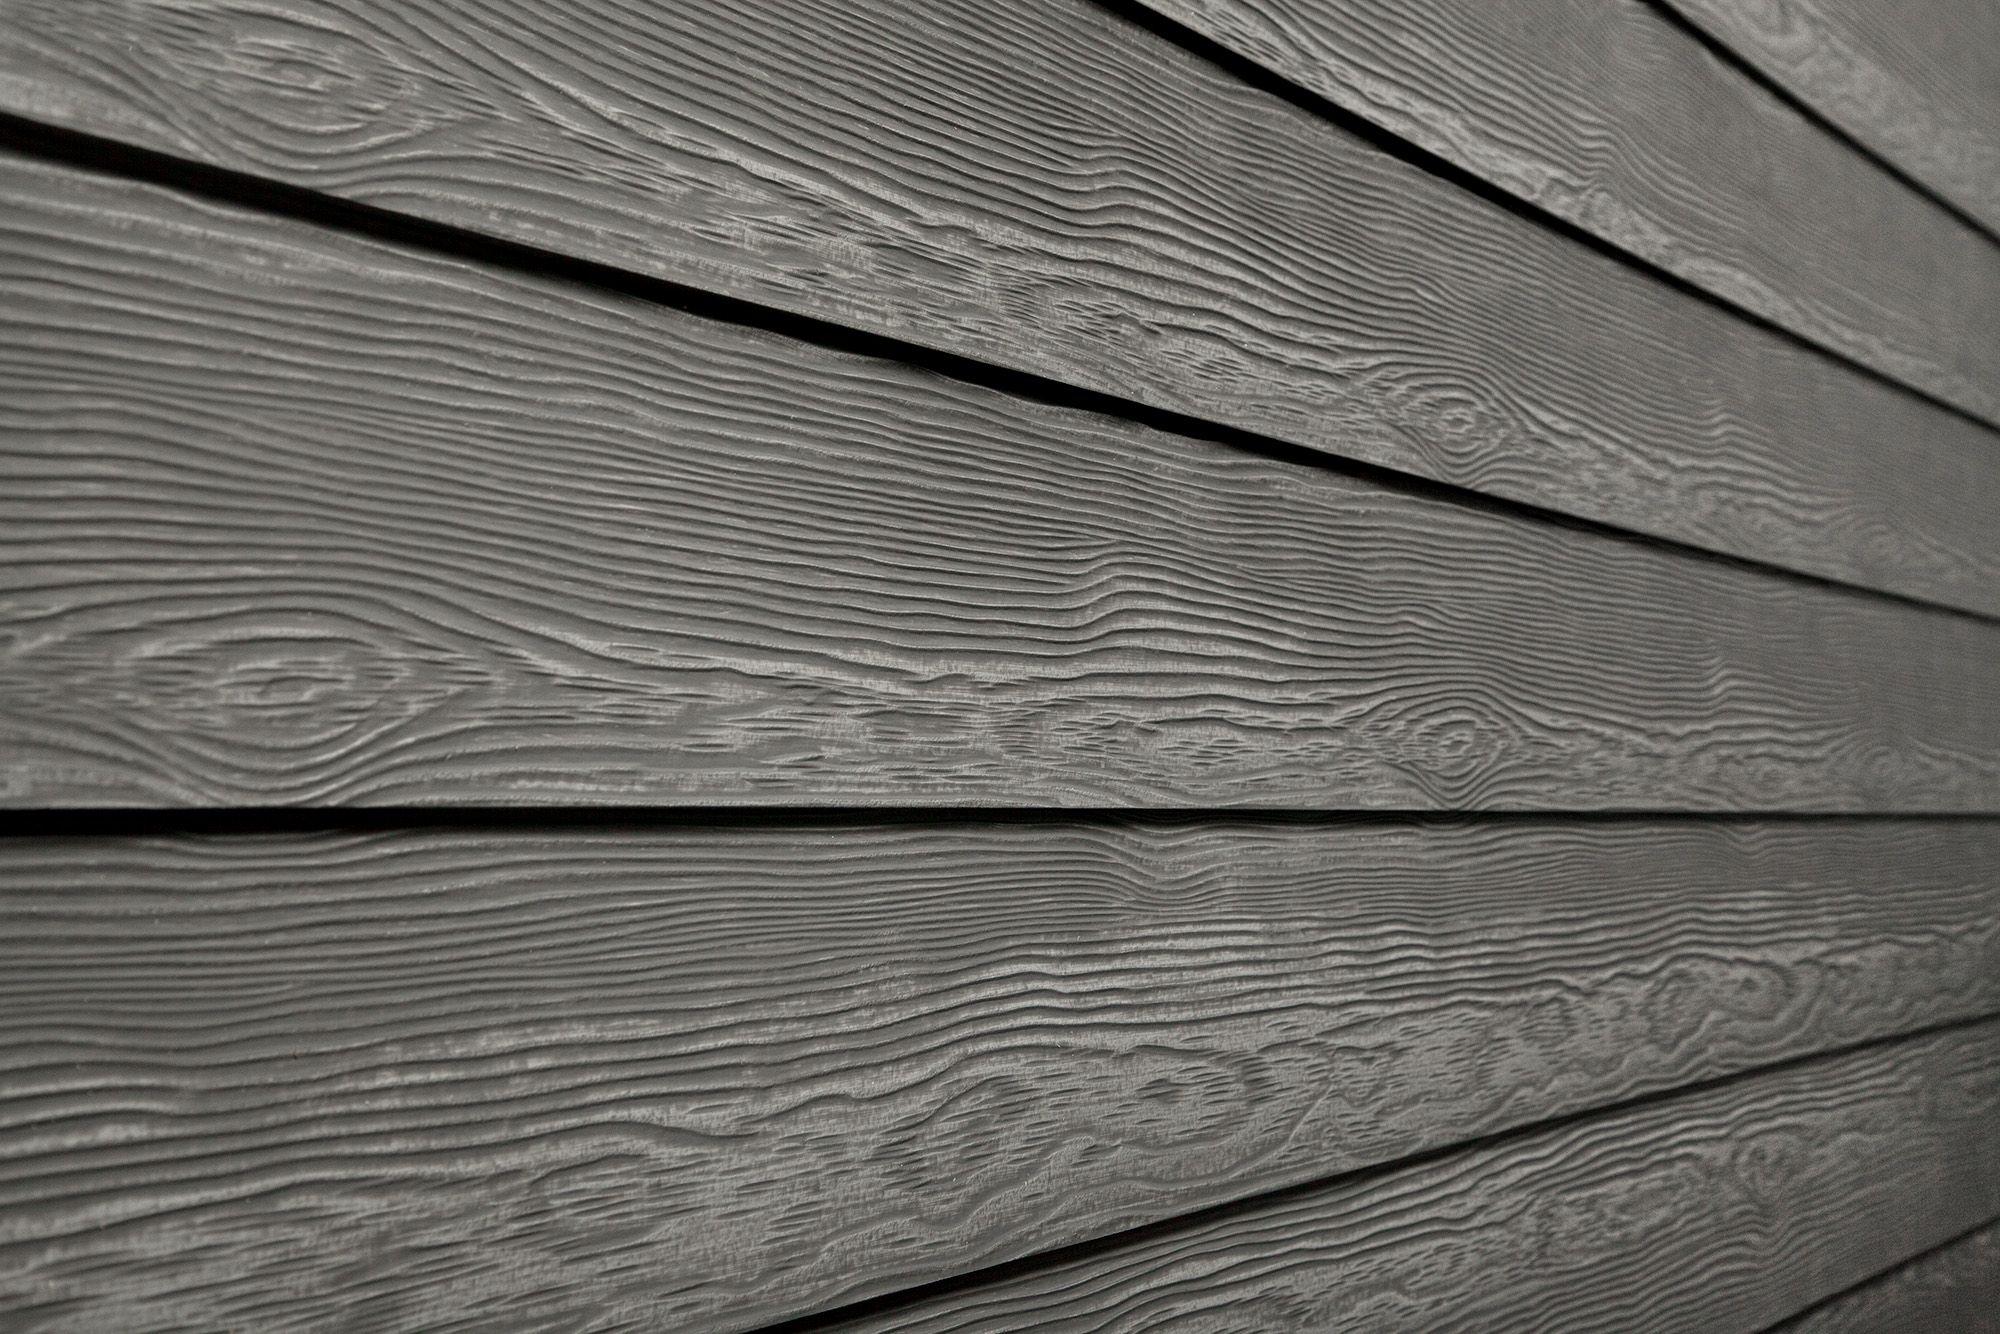 Rustic Fiber Cement Siding Coastal Gray 5 16 X8 1 4 X12